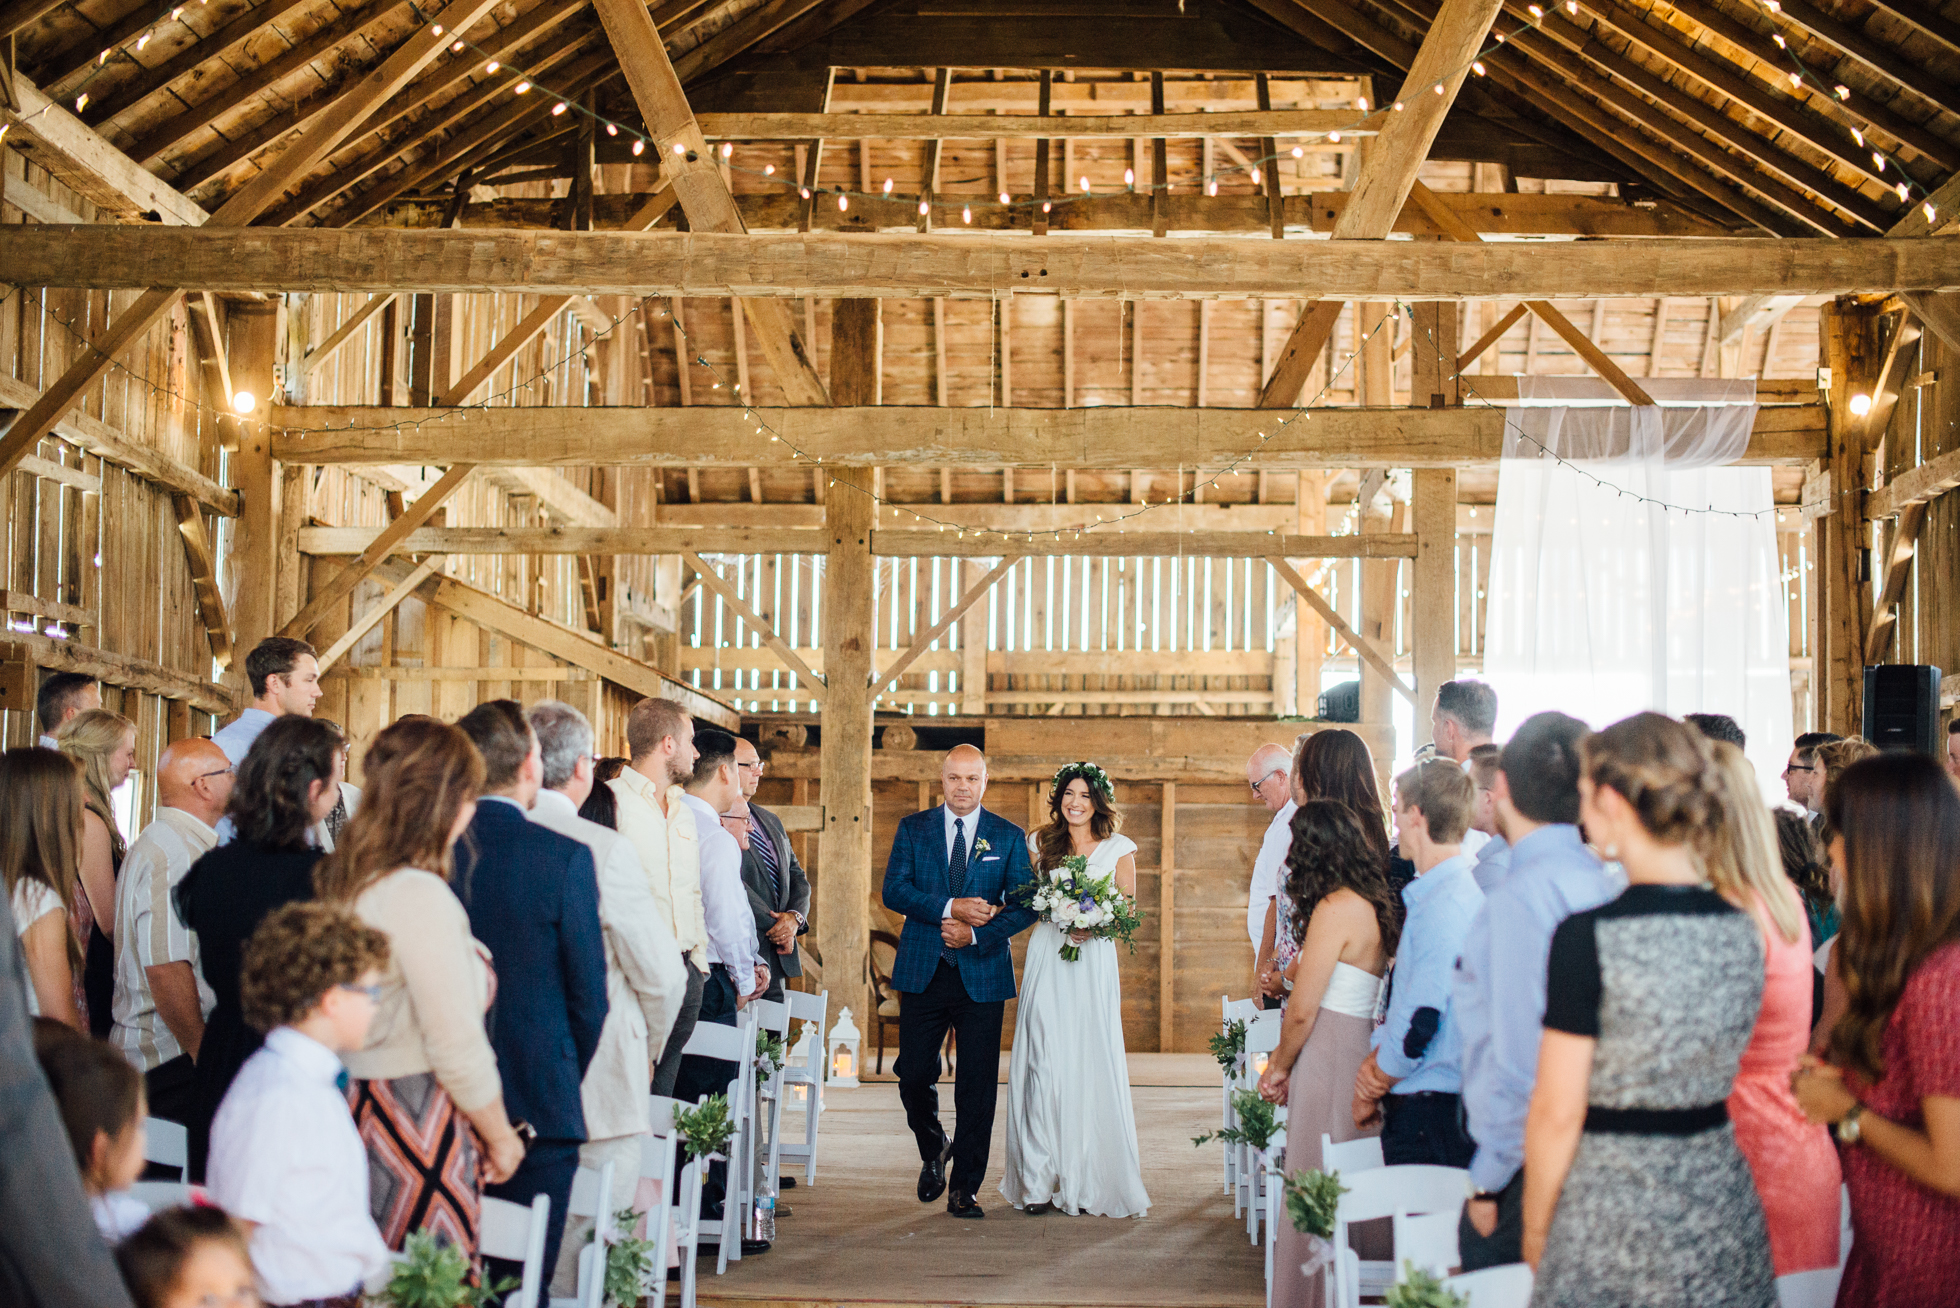 Downswell-Barn-Wedding-Photography-36.jpg